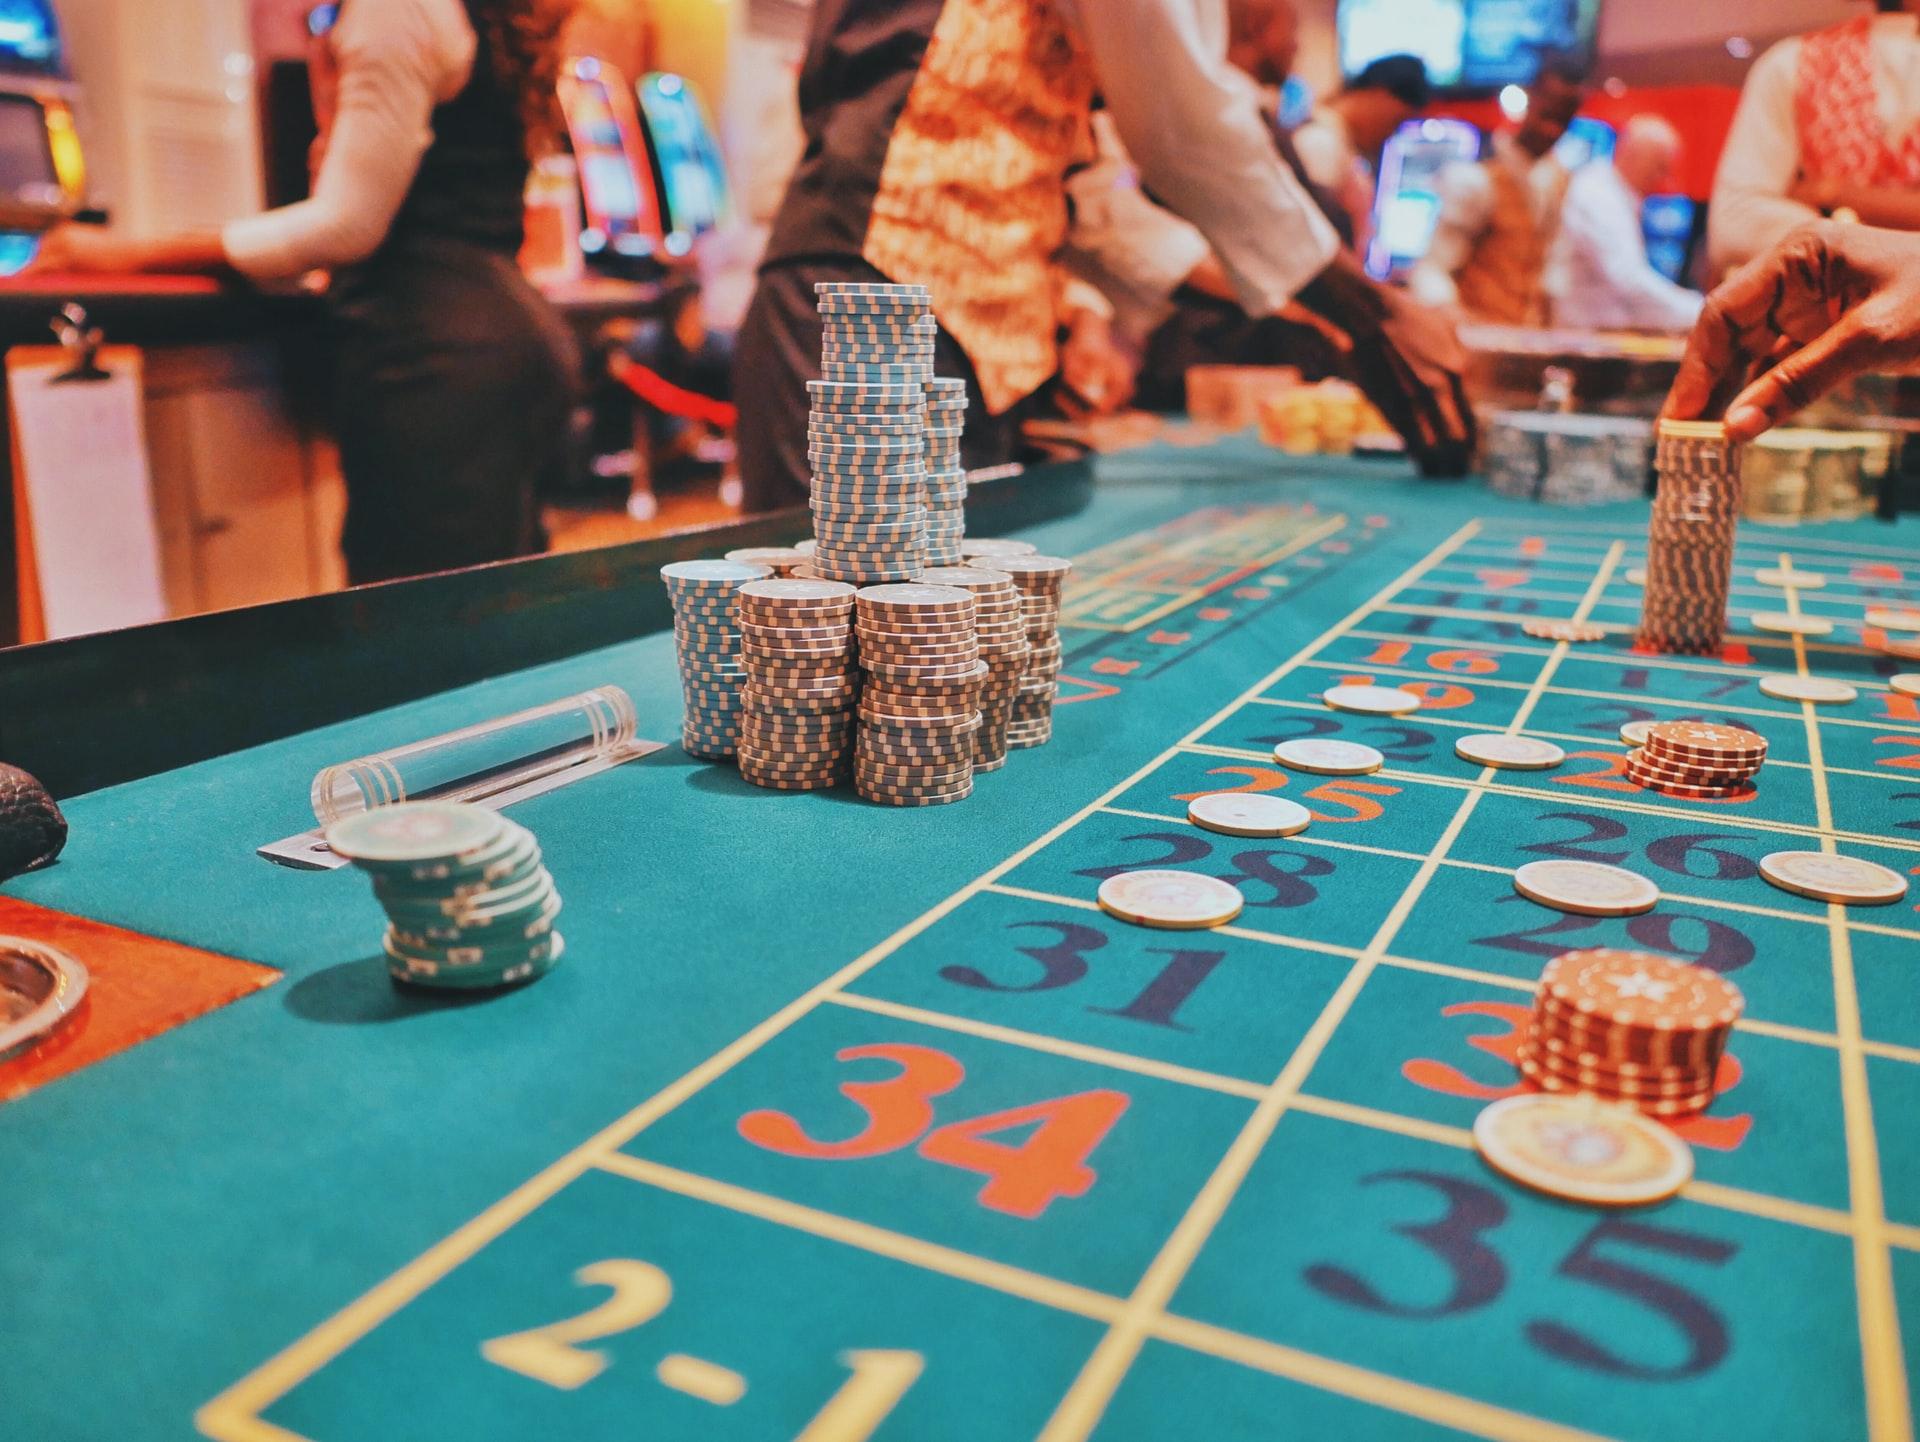 Why Choose Parimatch Casino